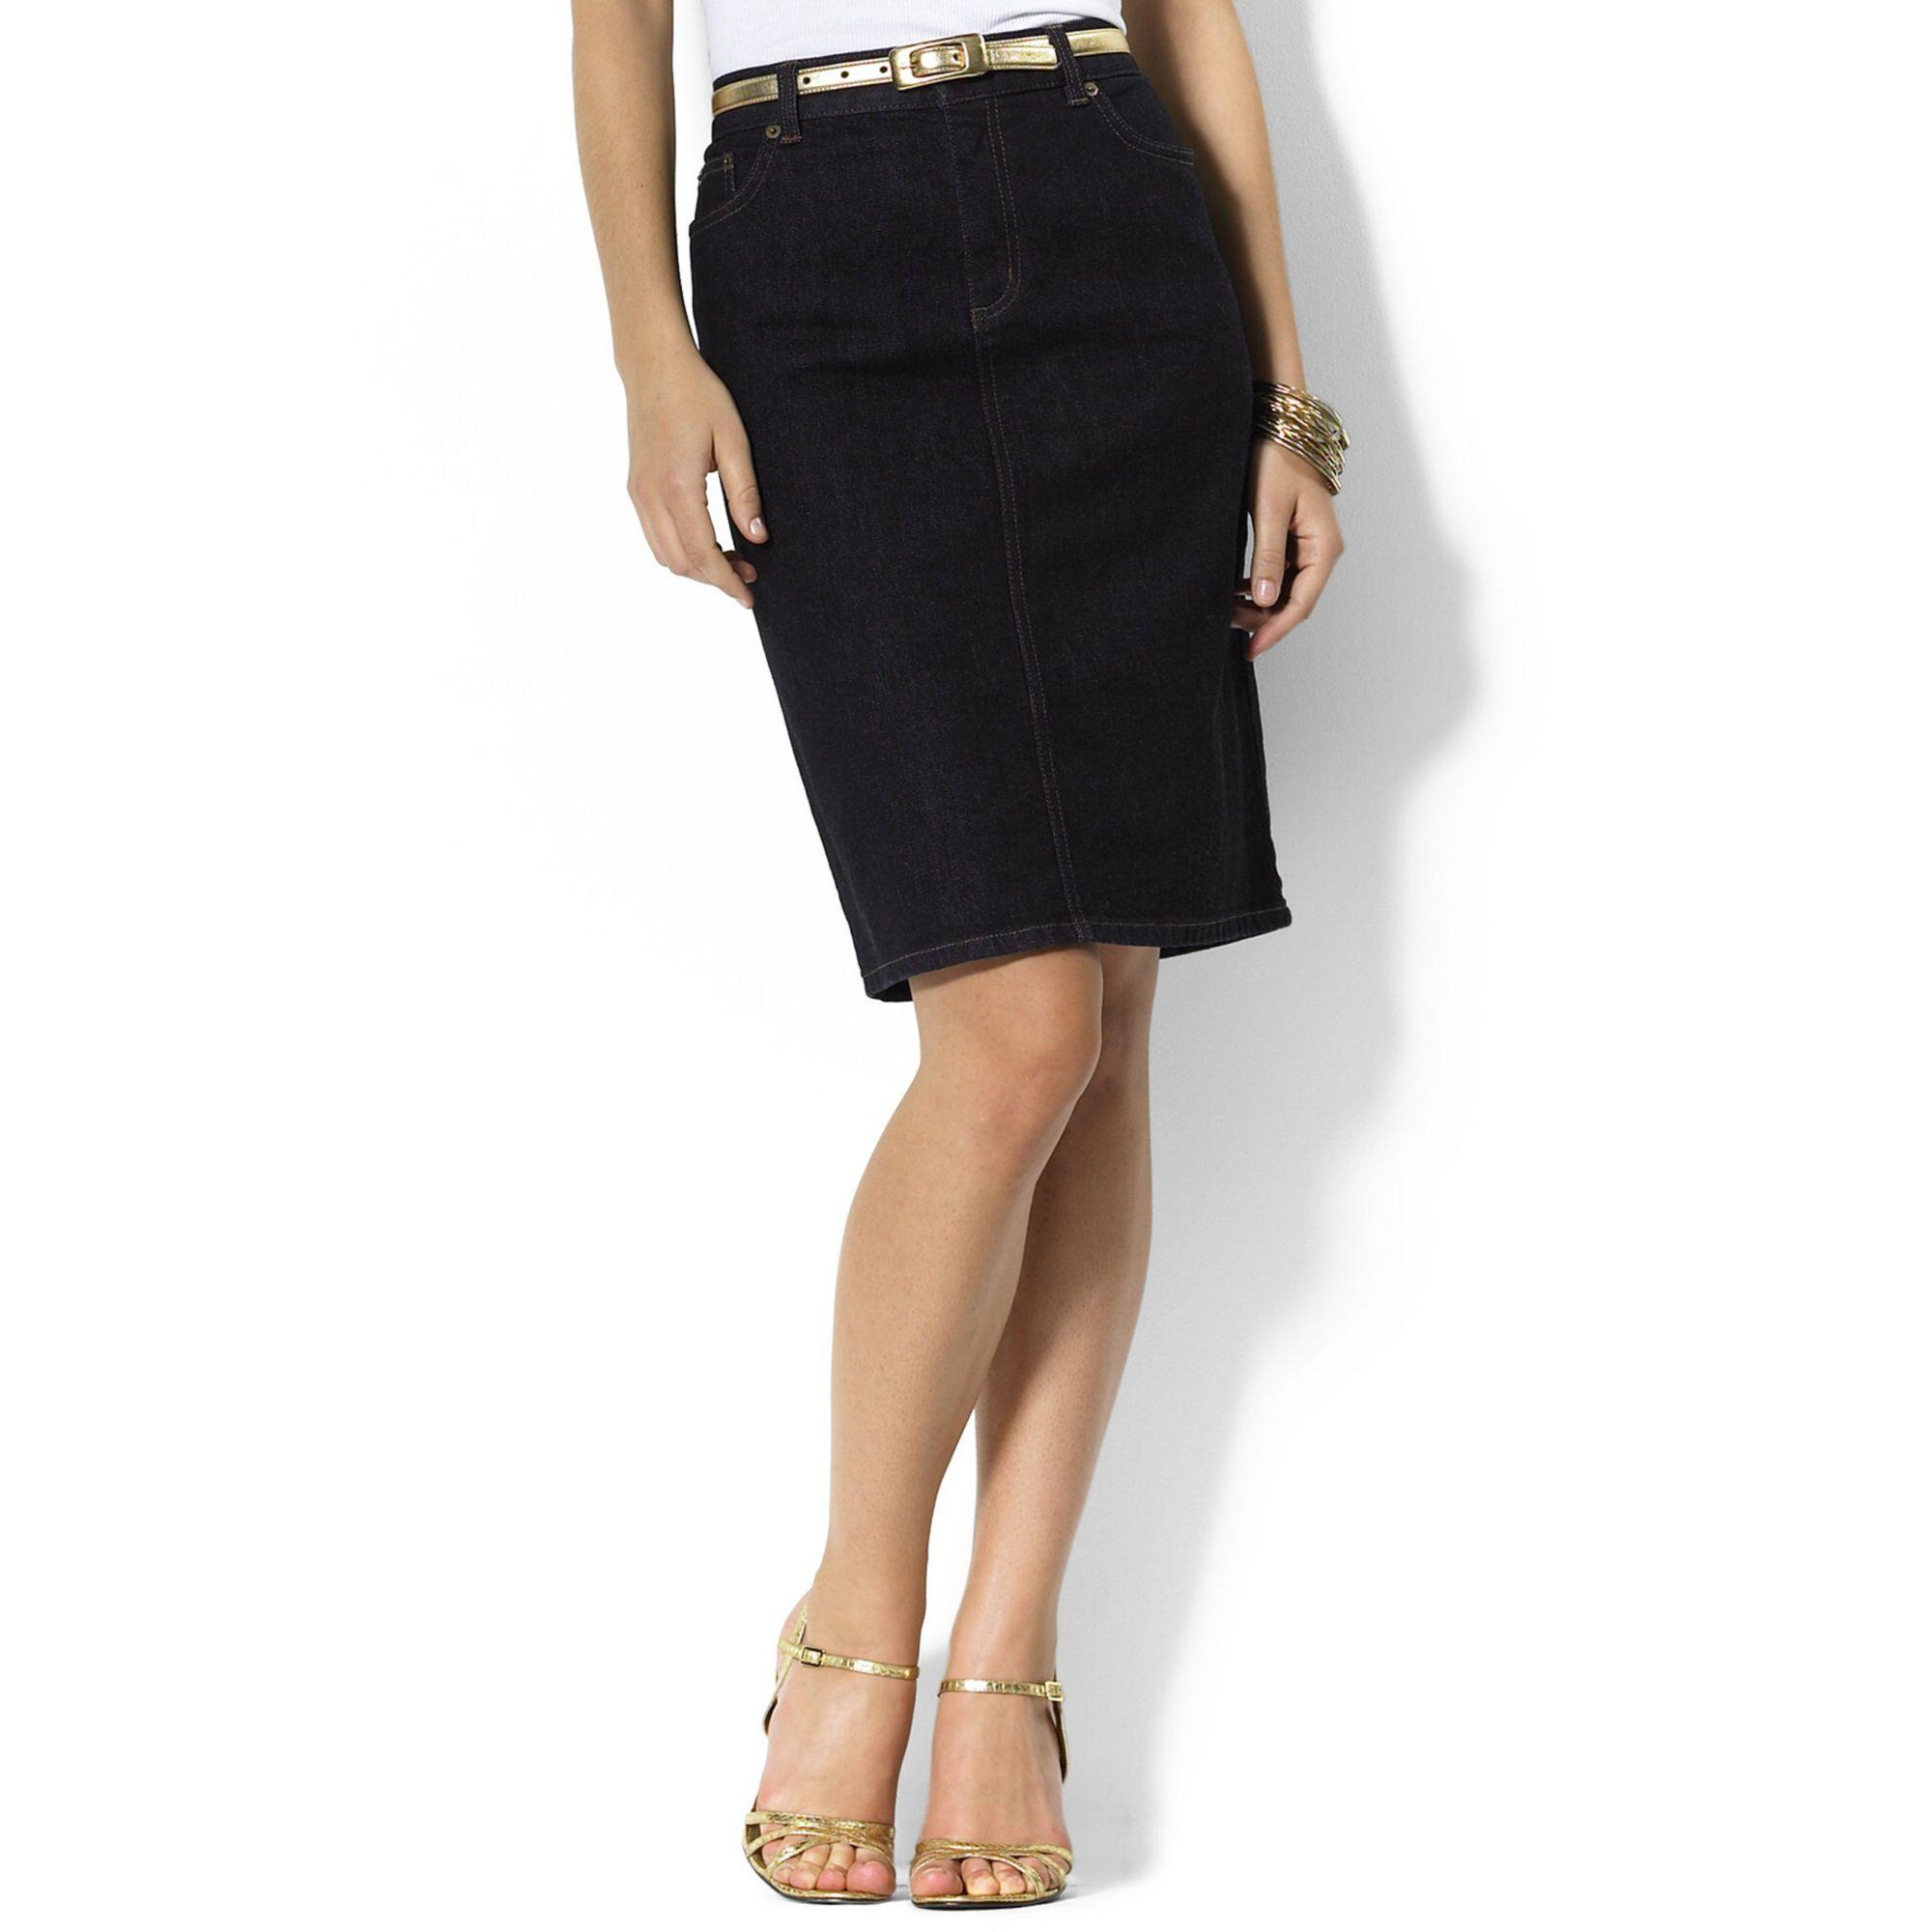 776e26f9fe8 Lyst - Lauren by Ralph Lauren Lauren Jeans Co Skirt Stretch Denim ...